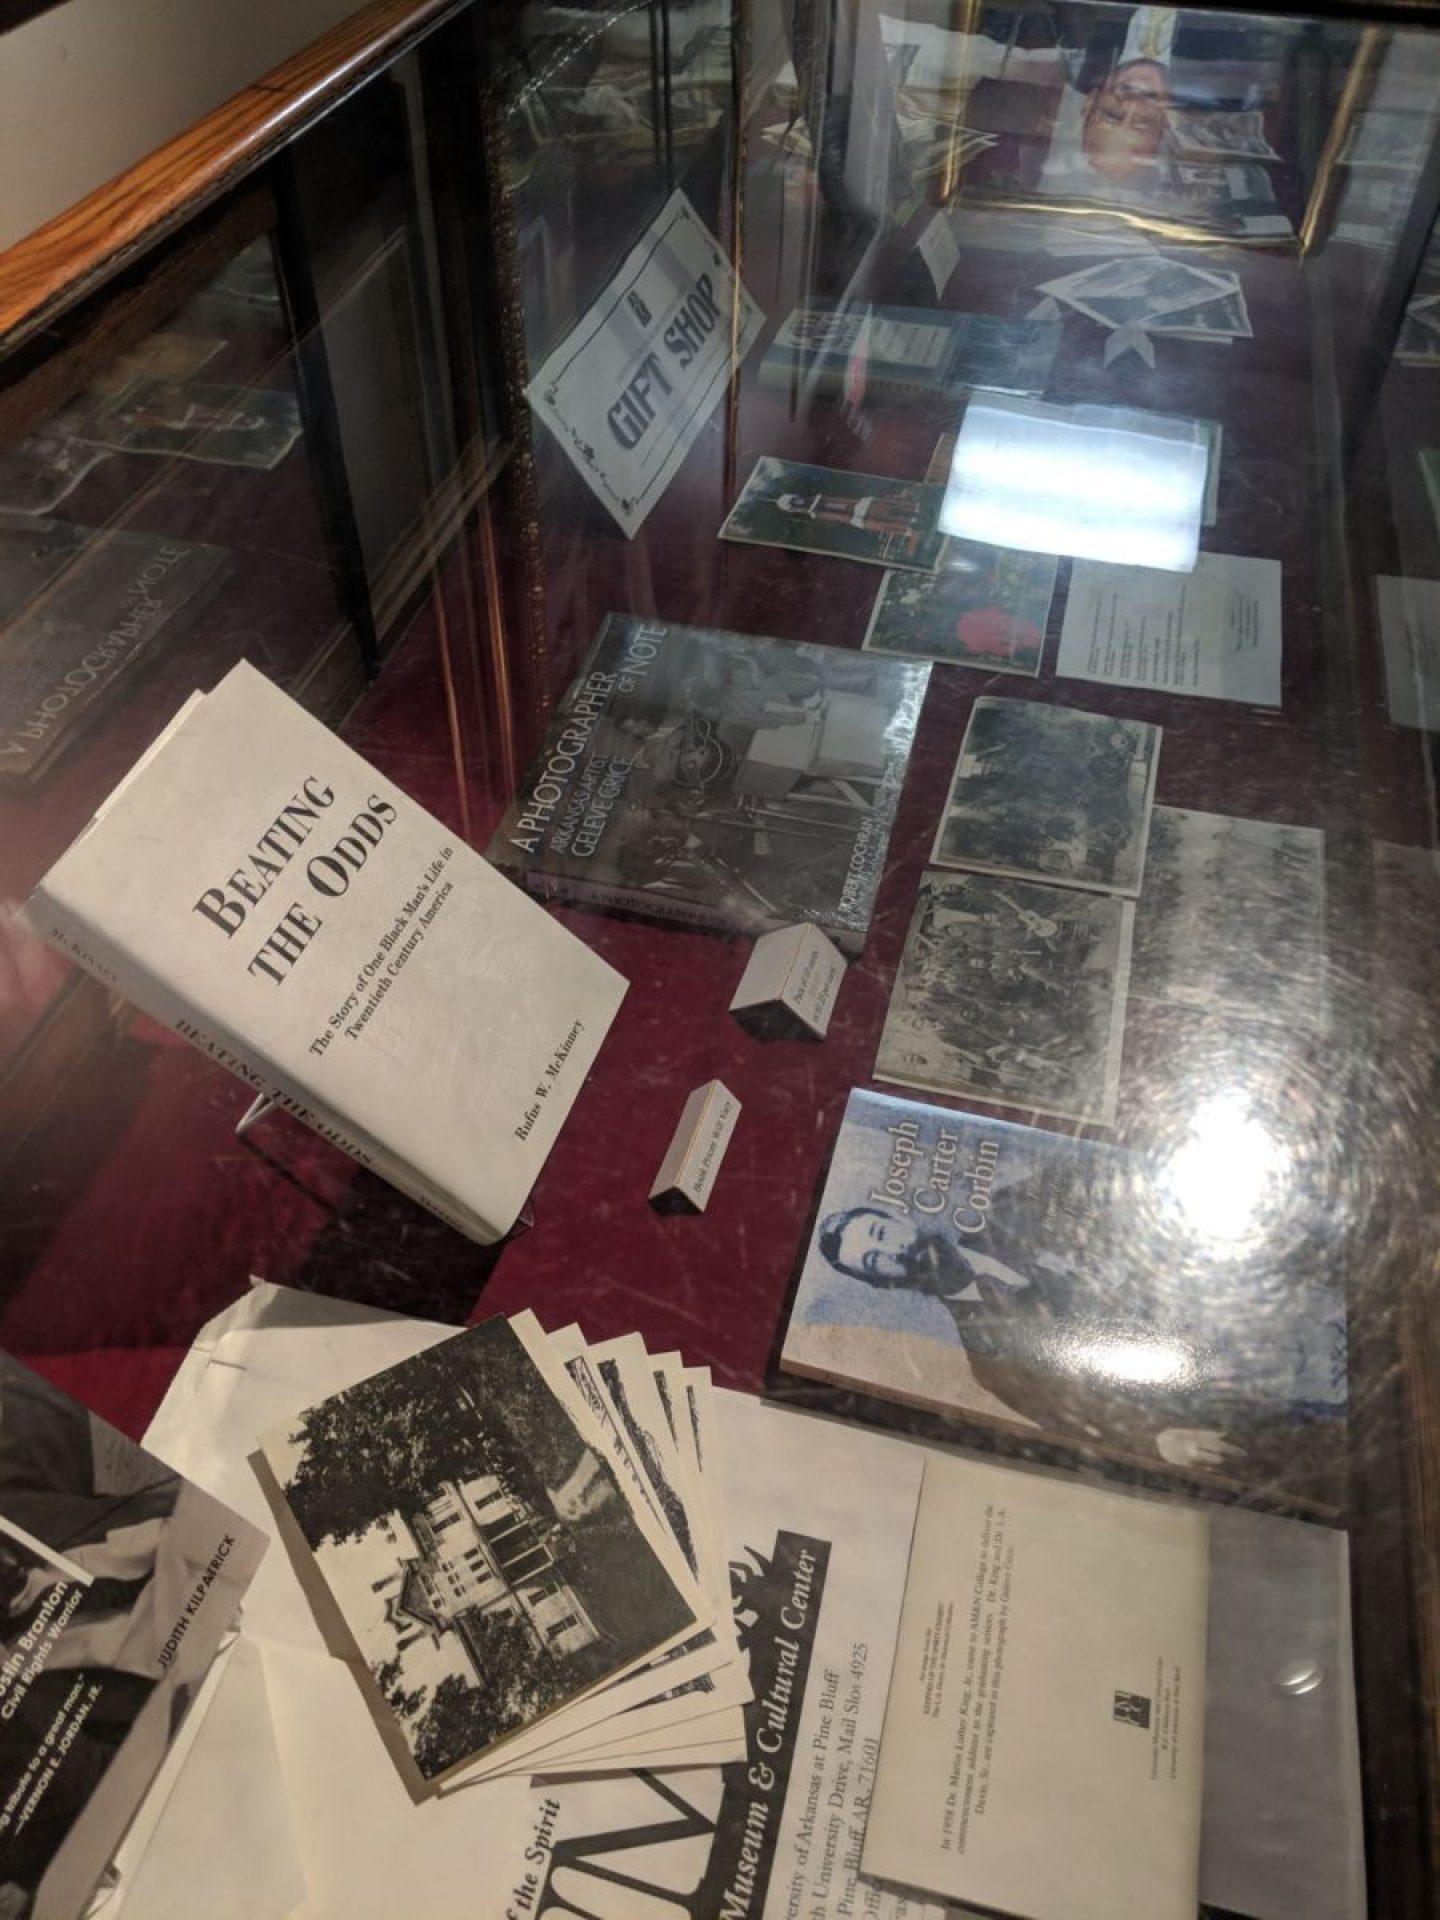 IMG_20190503_160541-1440x1920 Arkansas Delta Family Road Trip:  Black Heritage, Art & More!